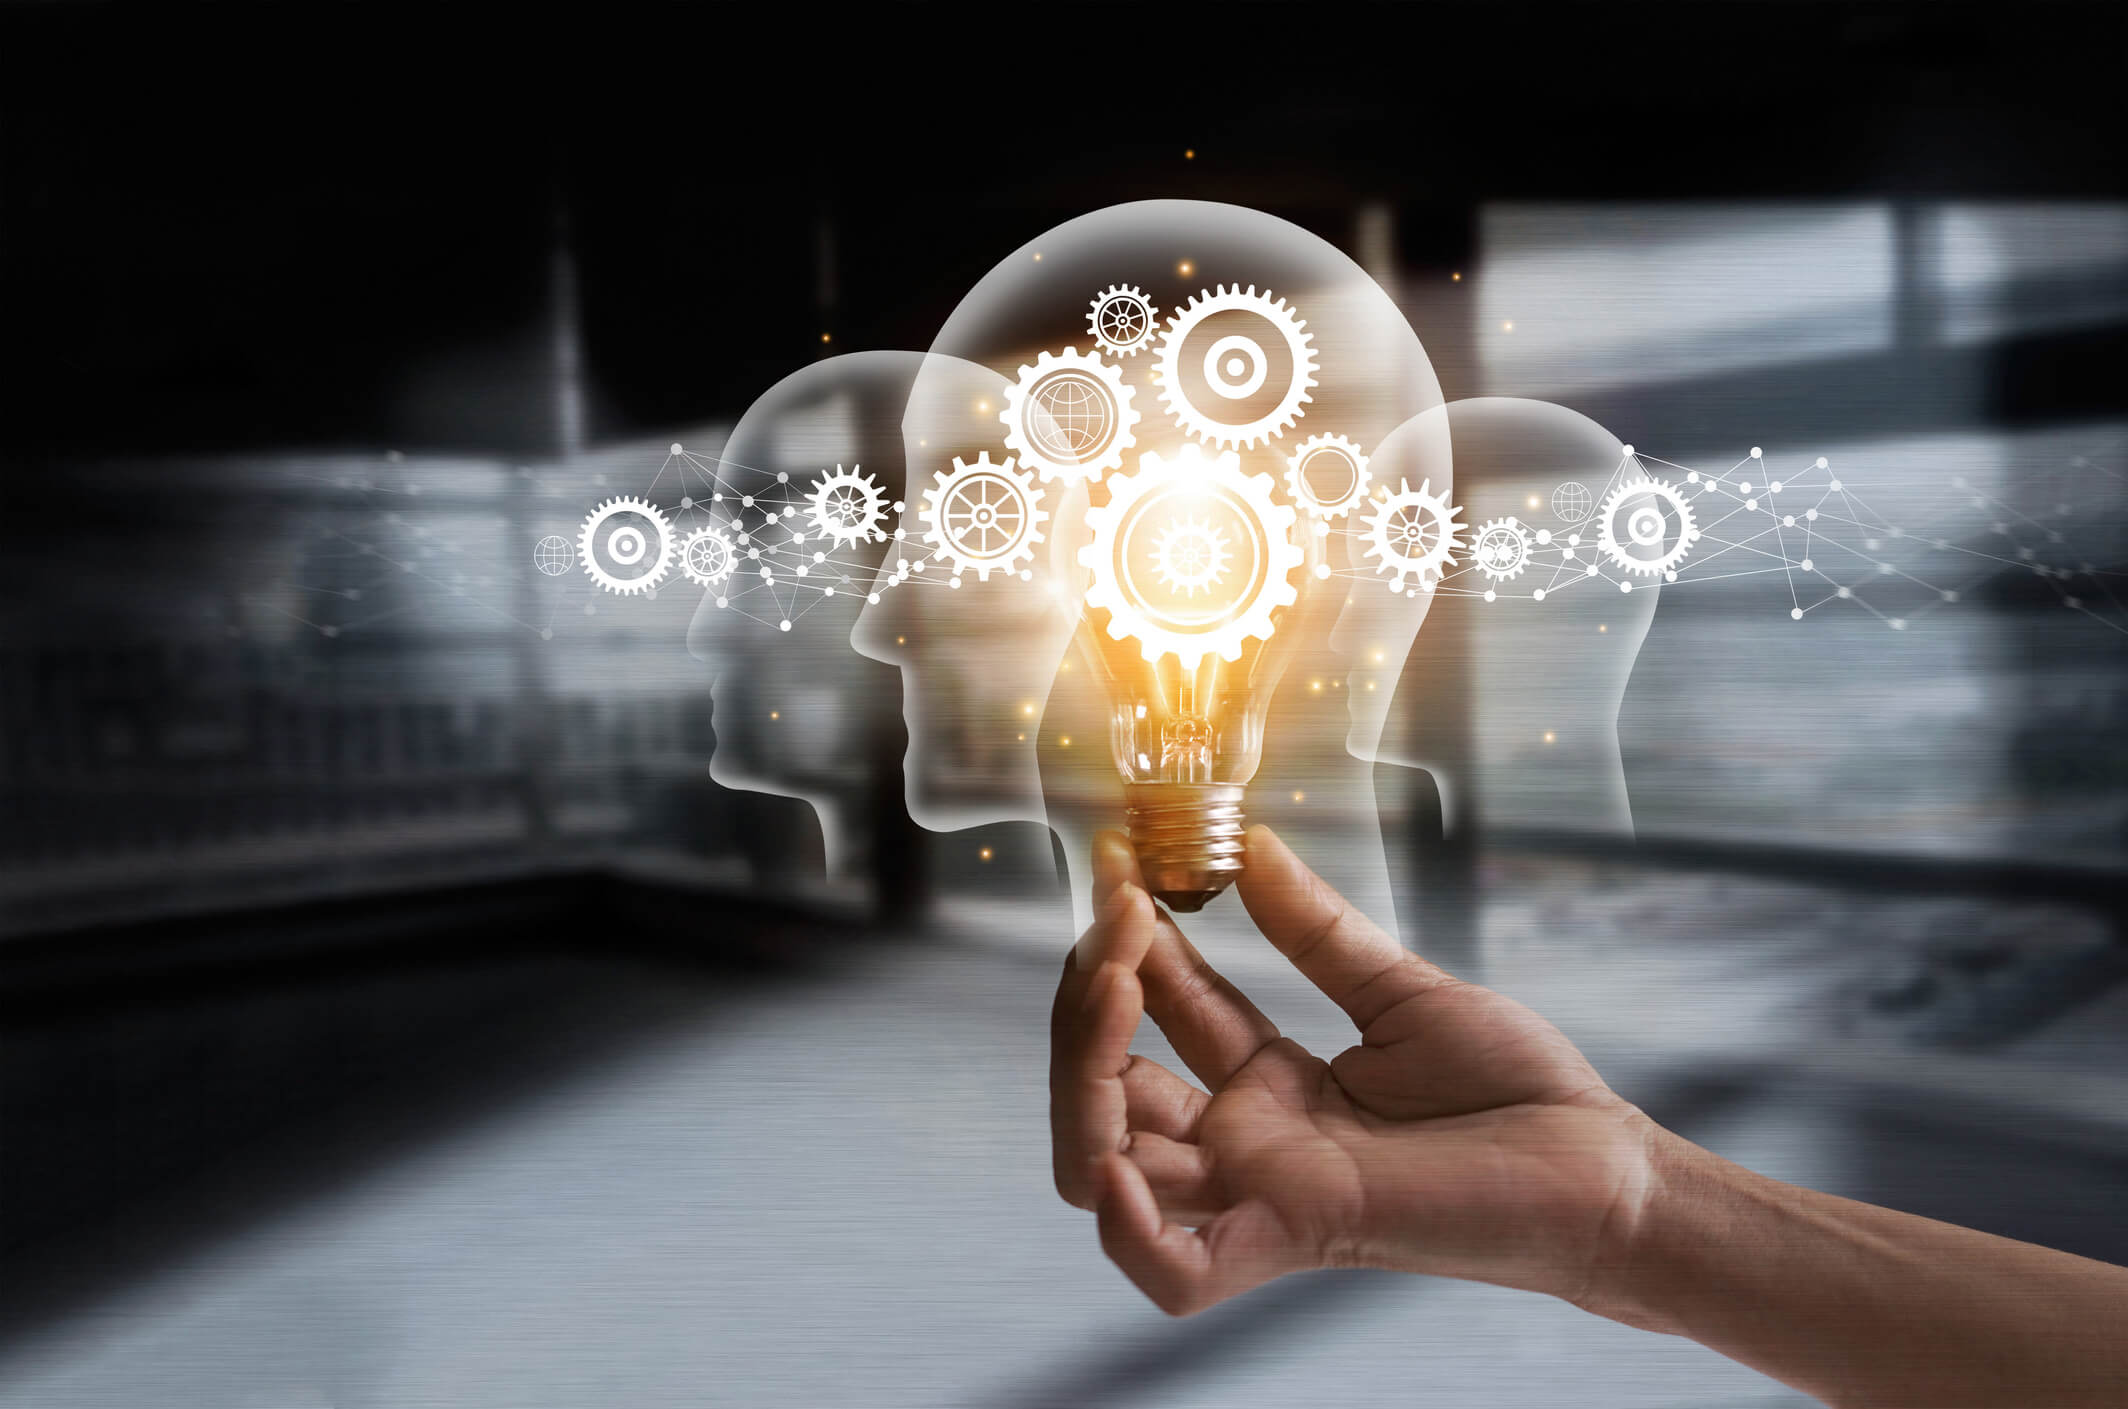 Inteligência comercial: entenda o que é e como aplicar na sua empresa